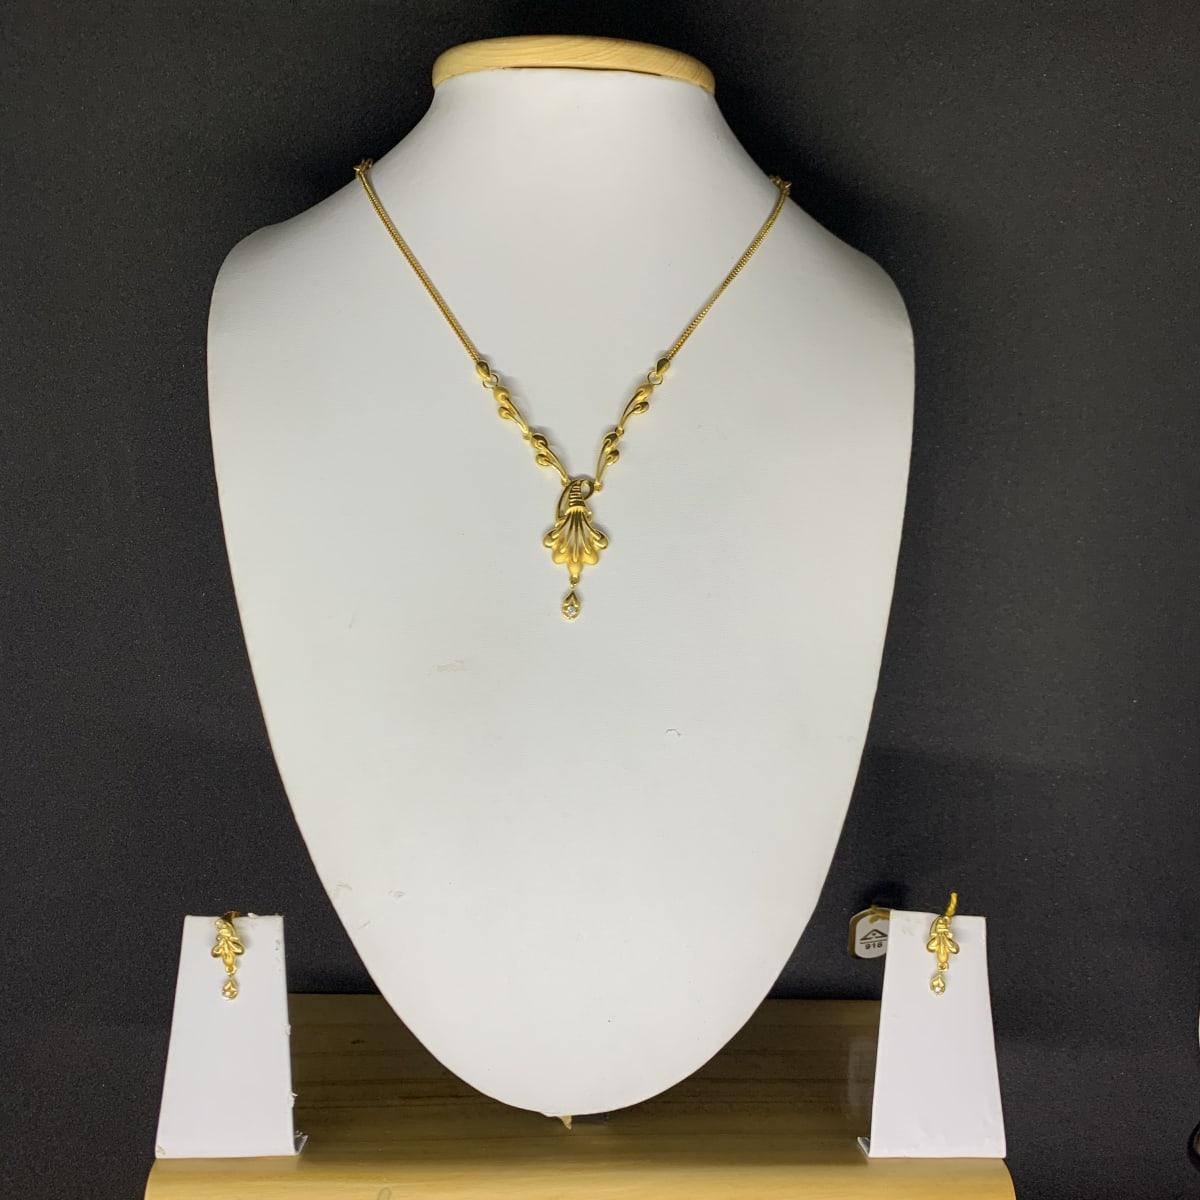 Cz Necklace With Kammal